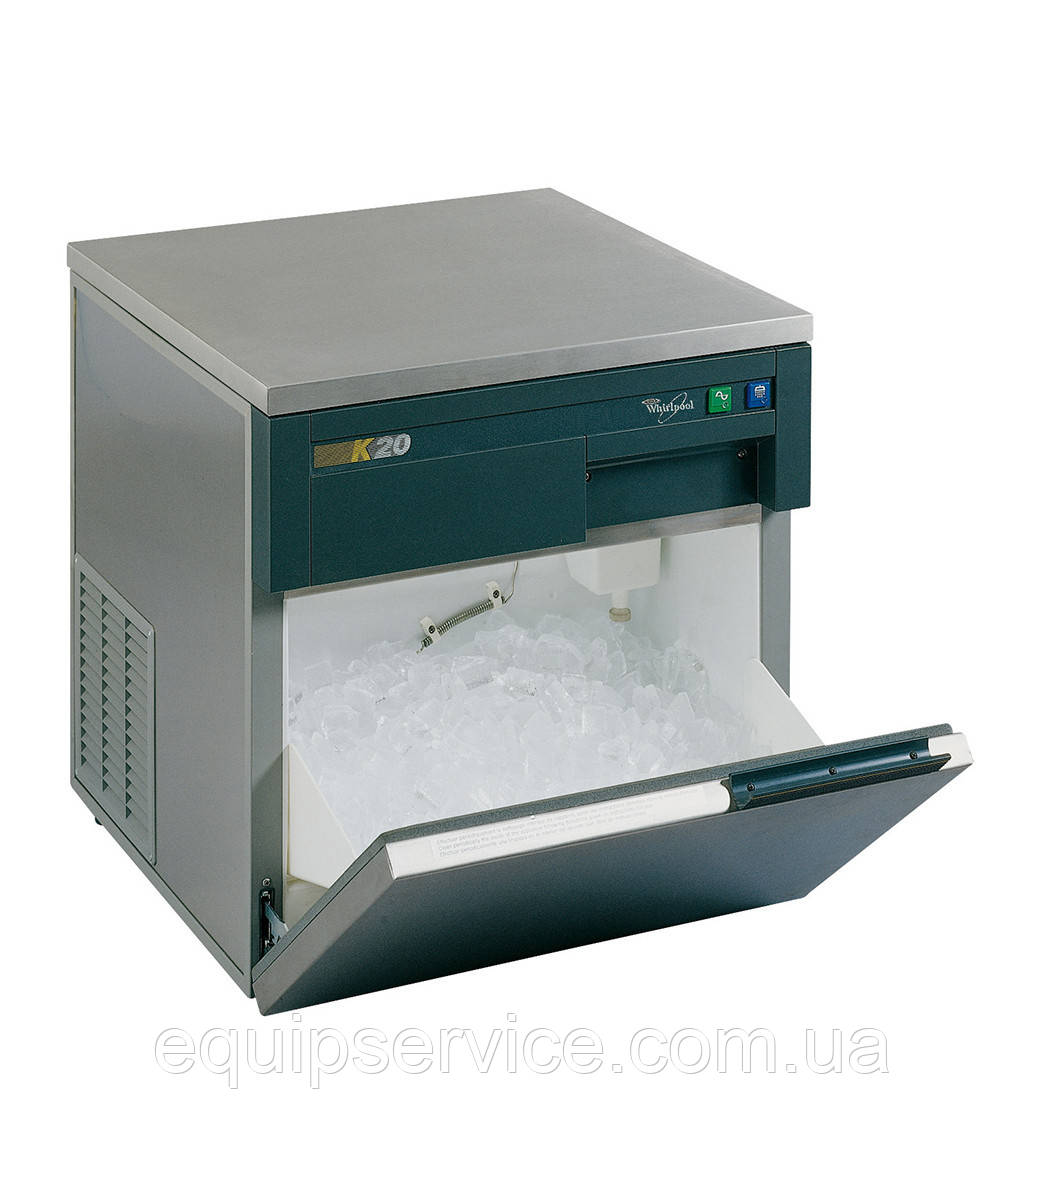 Льдогенератор AGB 022 Whirlpool